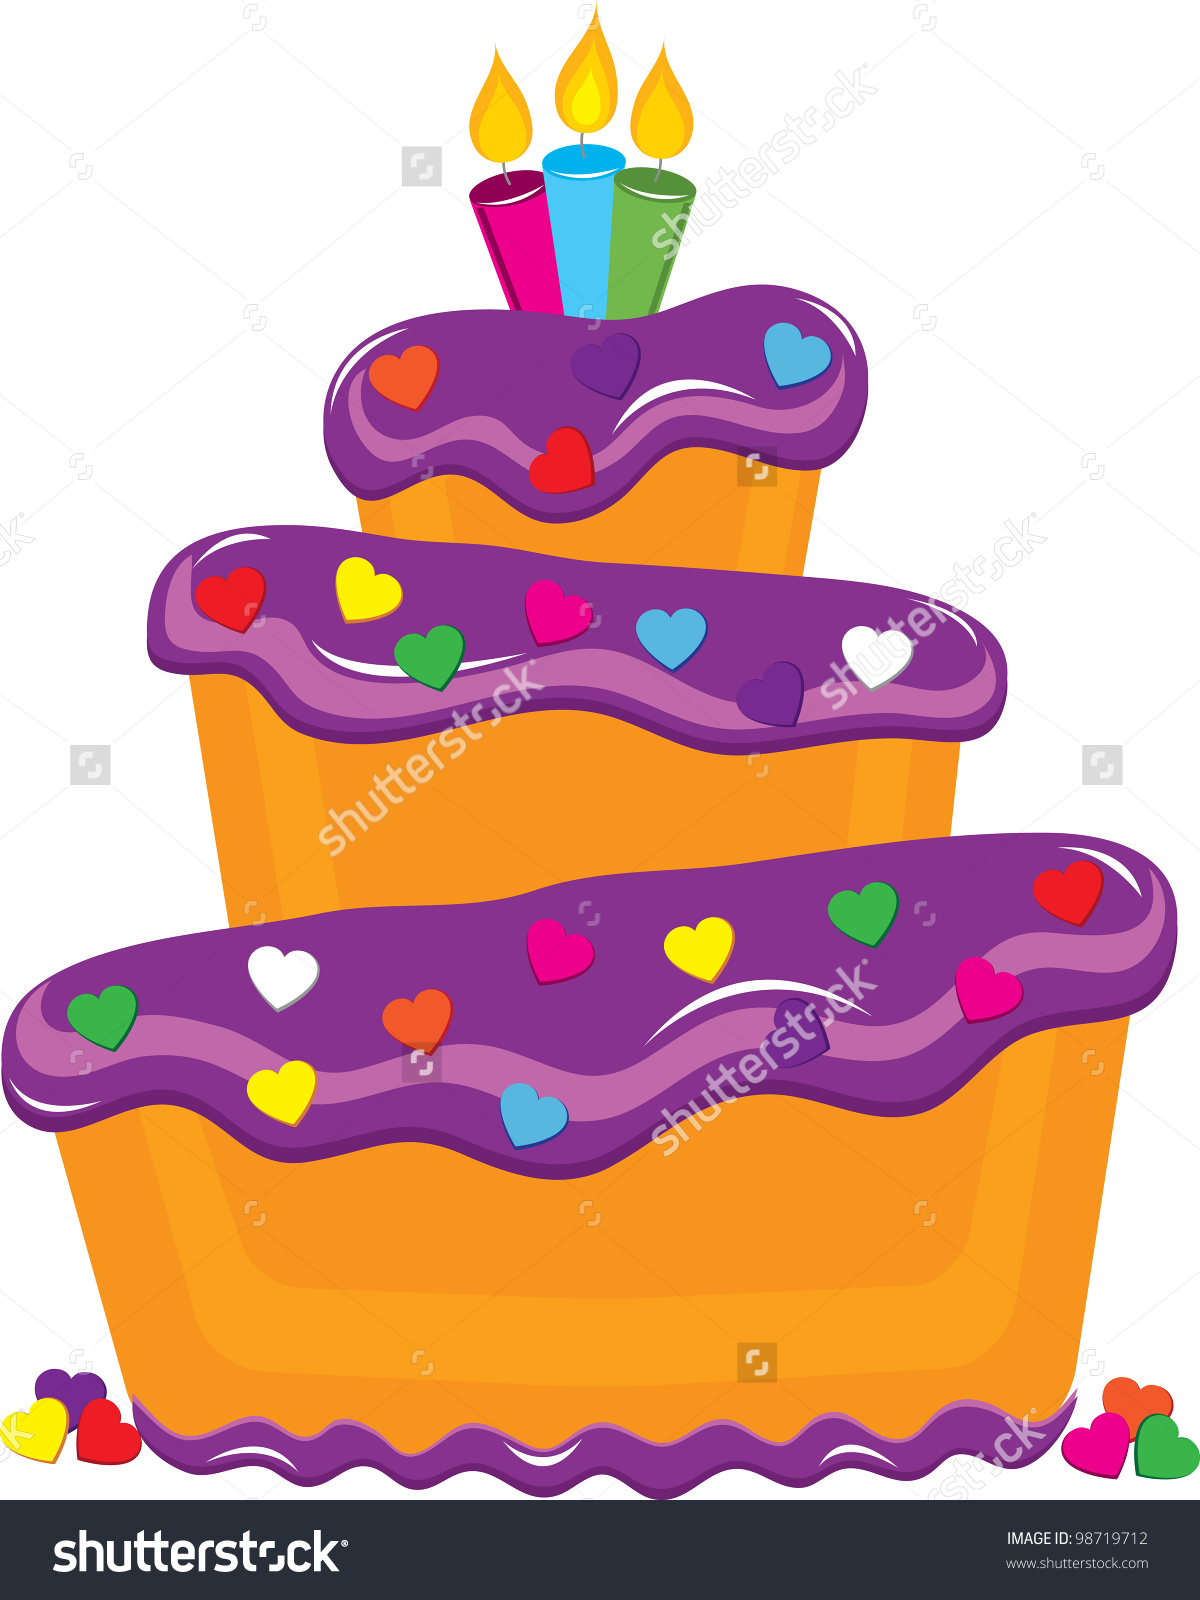 Clip Art Illustration Fancy Layer Cake Stock Illustration 98719712.